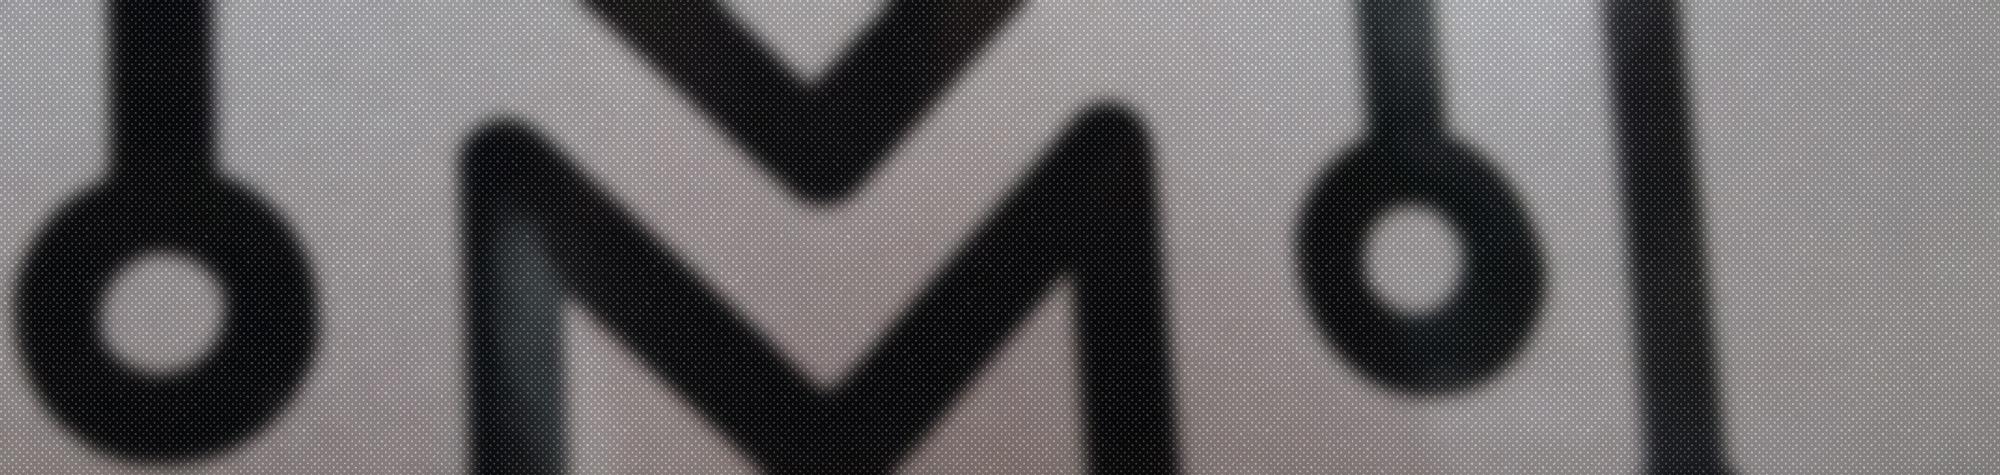 Vinyl Cutters // Bits